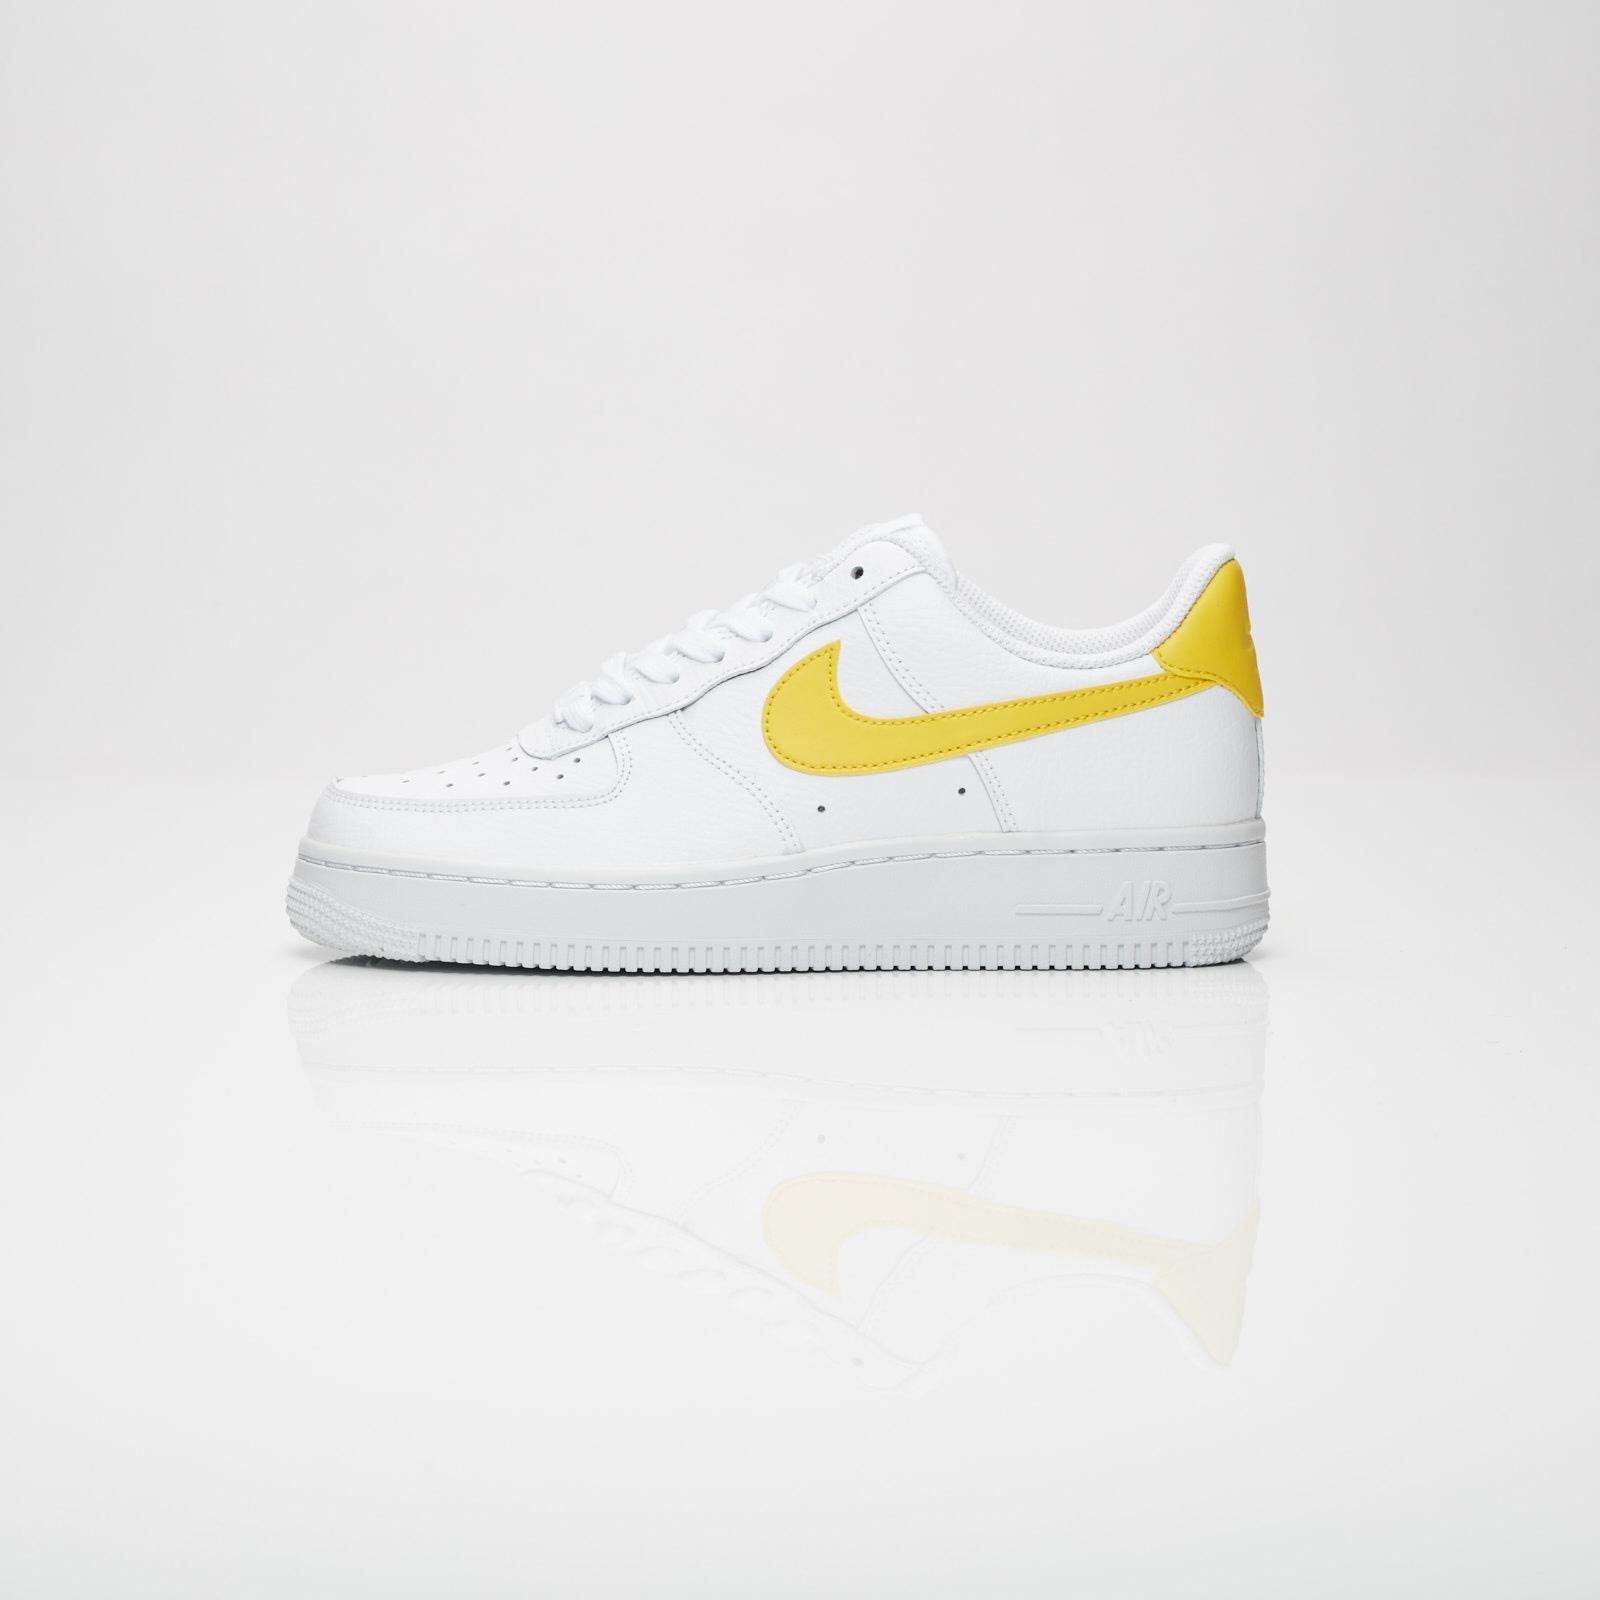 low priced b182f c02c8 Nike Wmns Air Force 1 07 - 315115-150 - Sneakersnstuff   sneakers ...